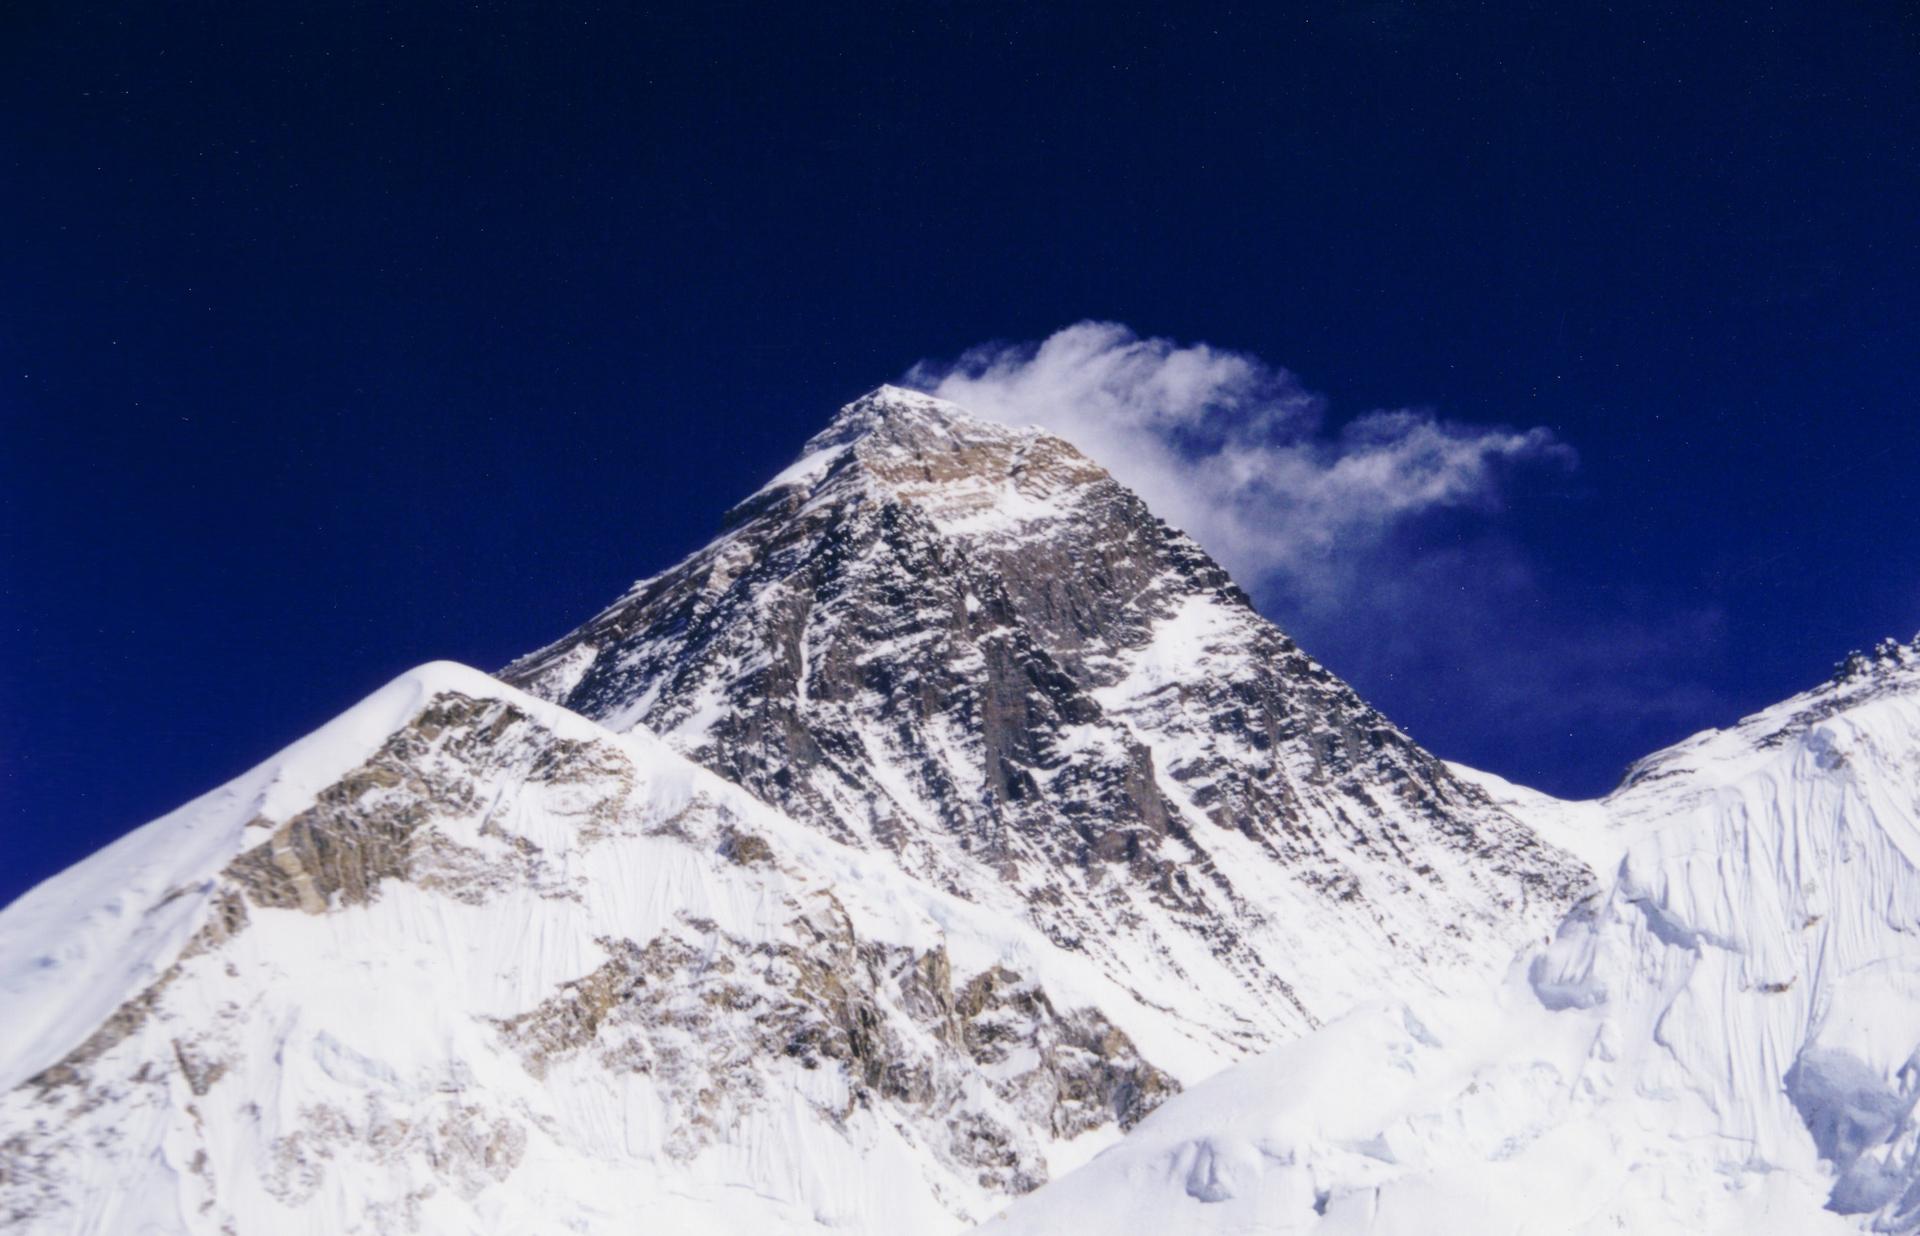 my everest nepal nepal himalaya 8848 by majo